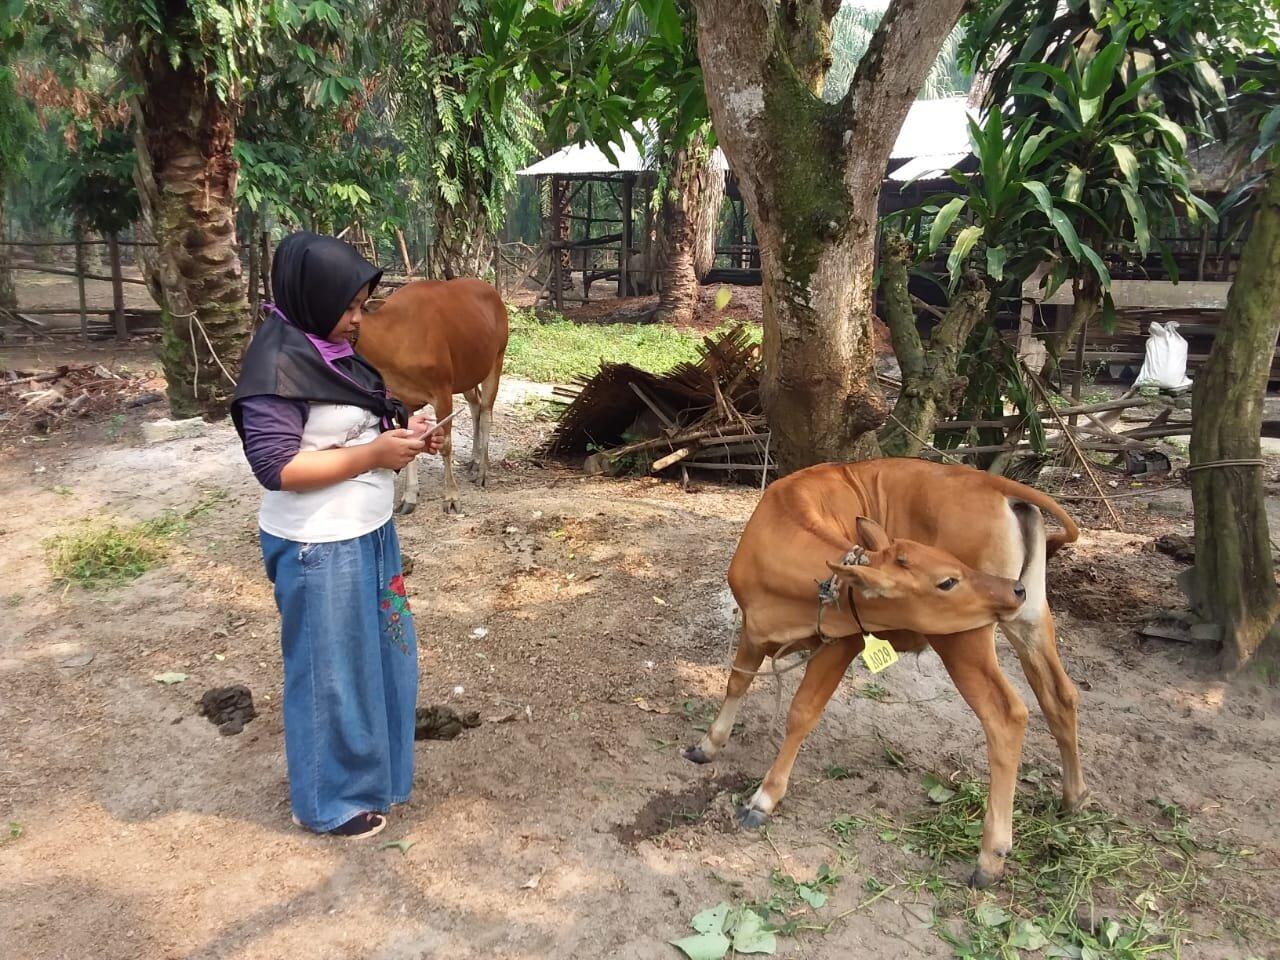 Field Officer Ms Henni Rahmawati collecting animal production data in Riau, September 2019.  Photo: Yeni Widiawati